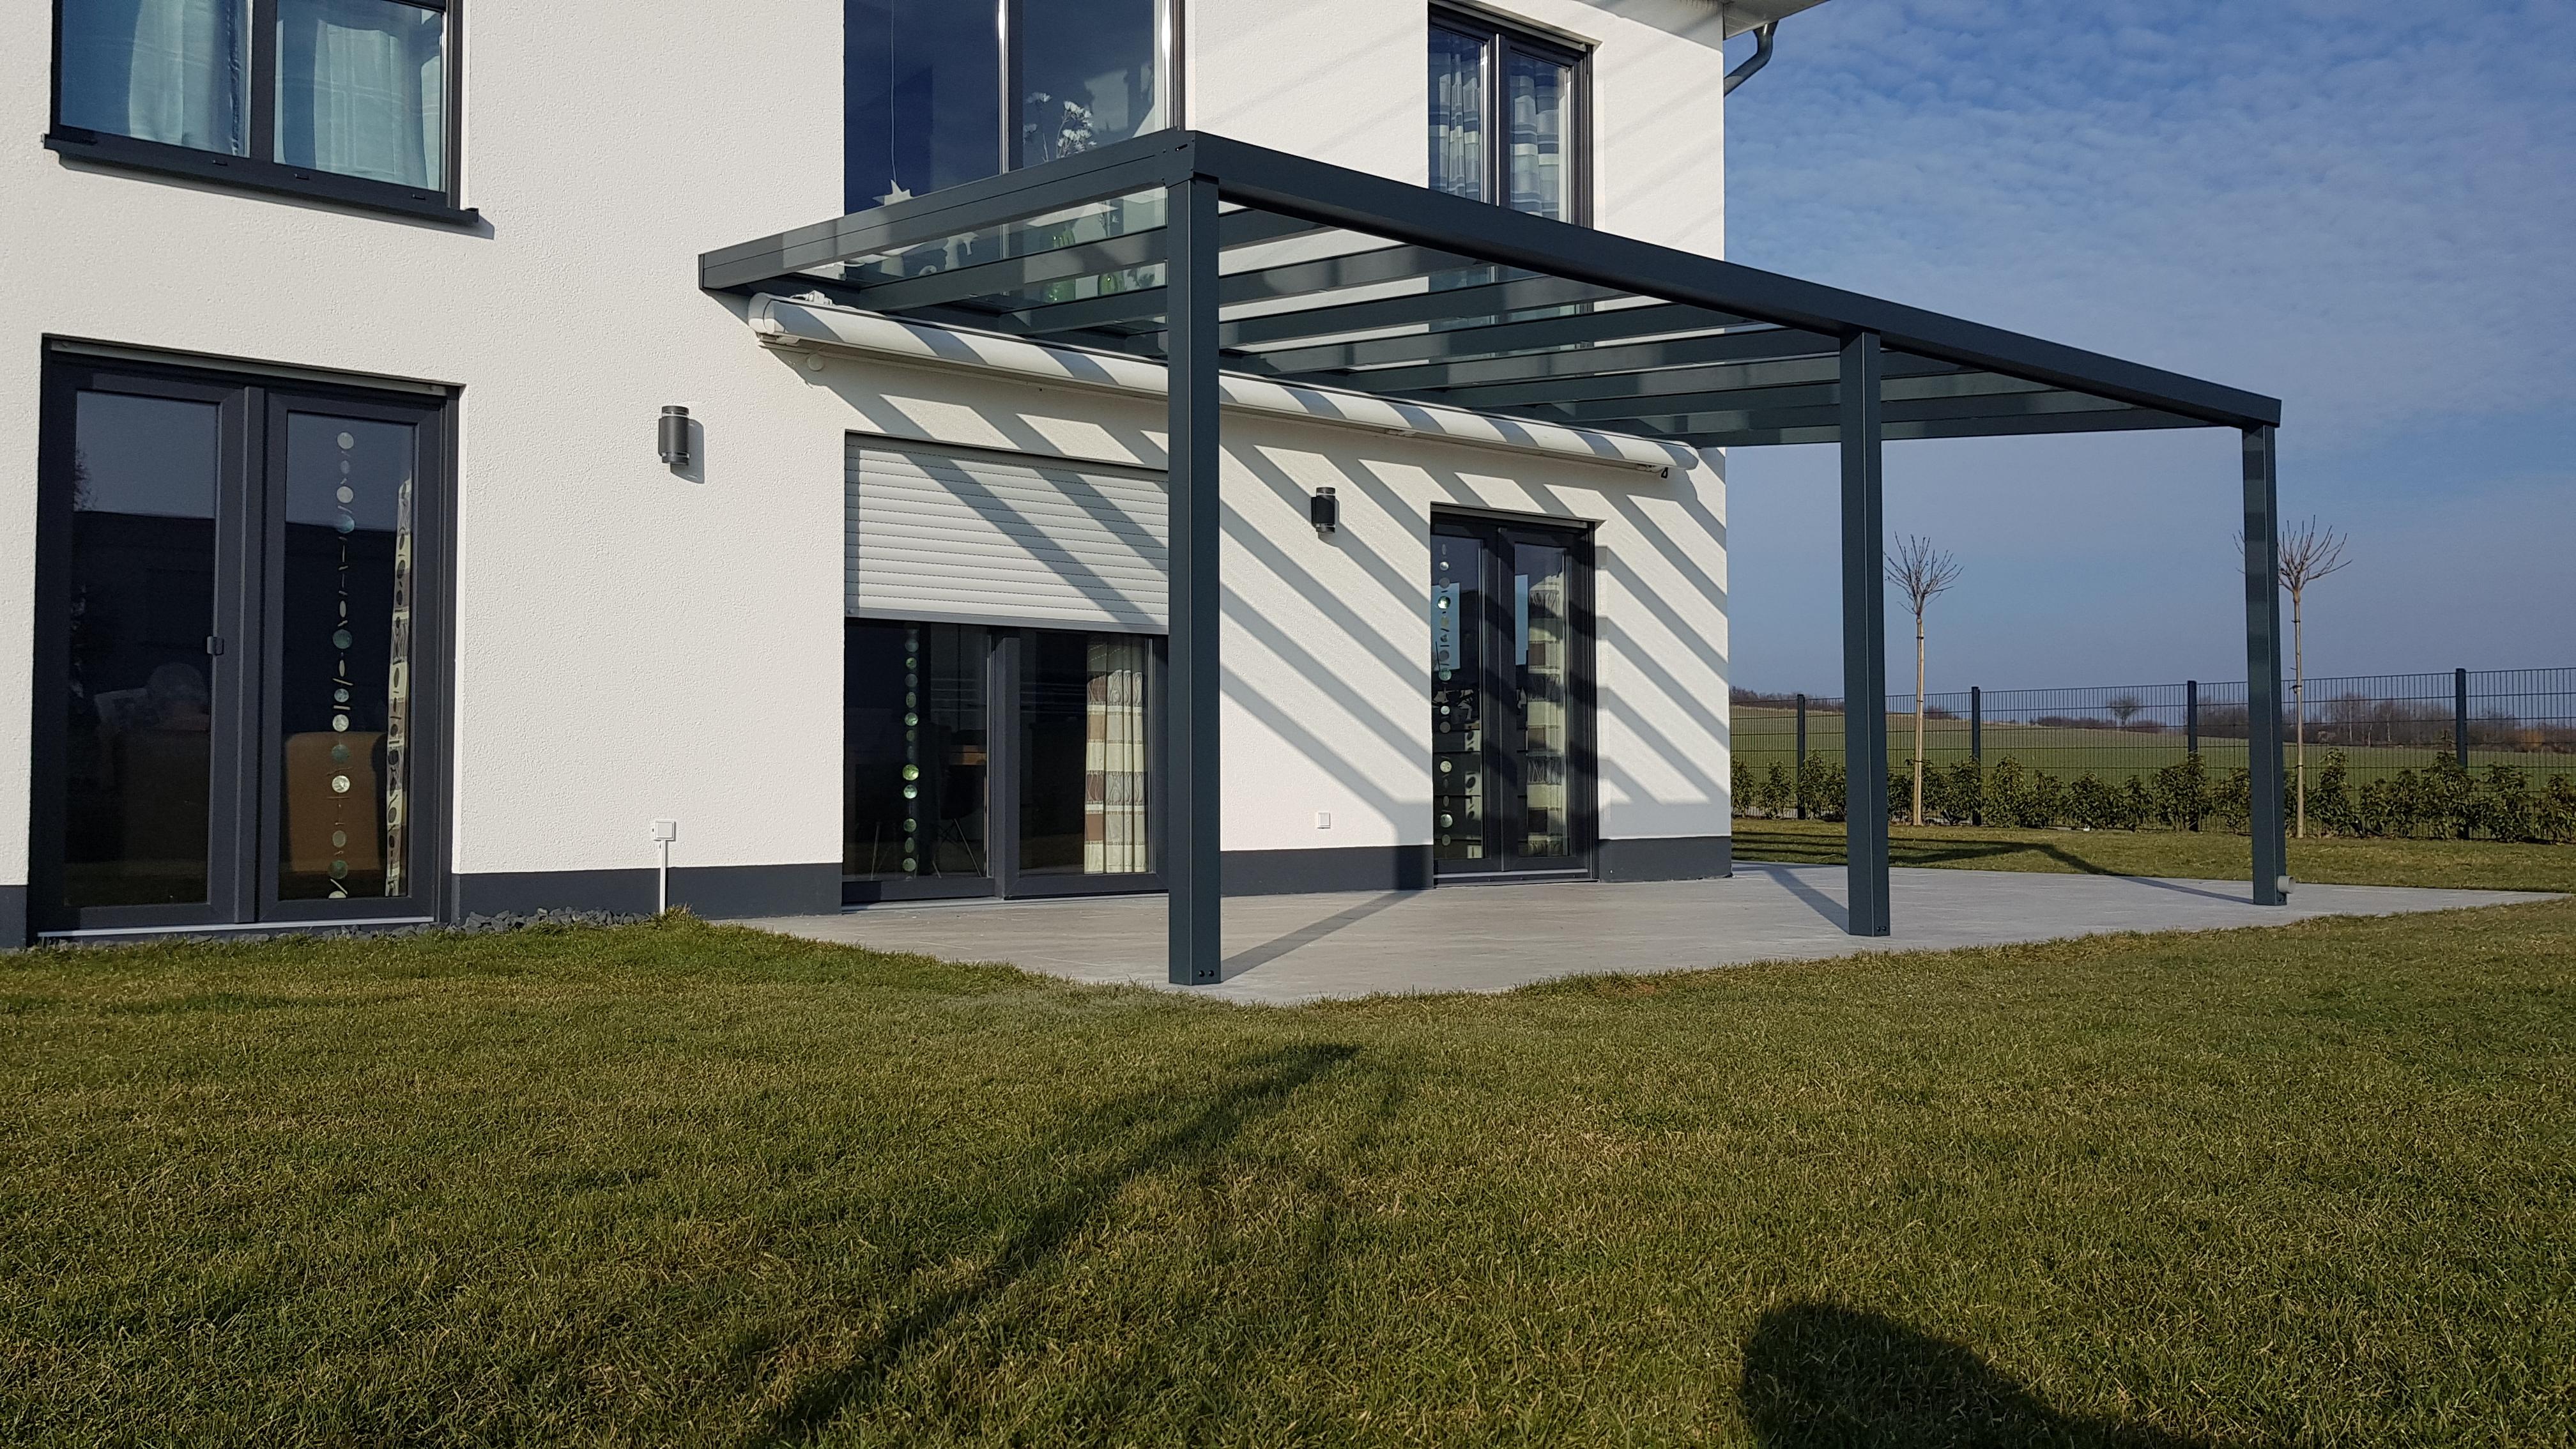 Terrassendach Aus Aluminium Mit Vsg Glas Kompl Neu ~ TerrassenÜberdachung carport aluminium terrassendach anthrazit vsg